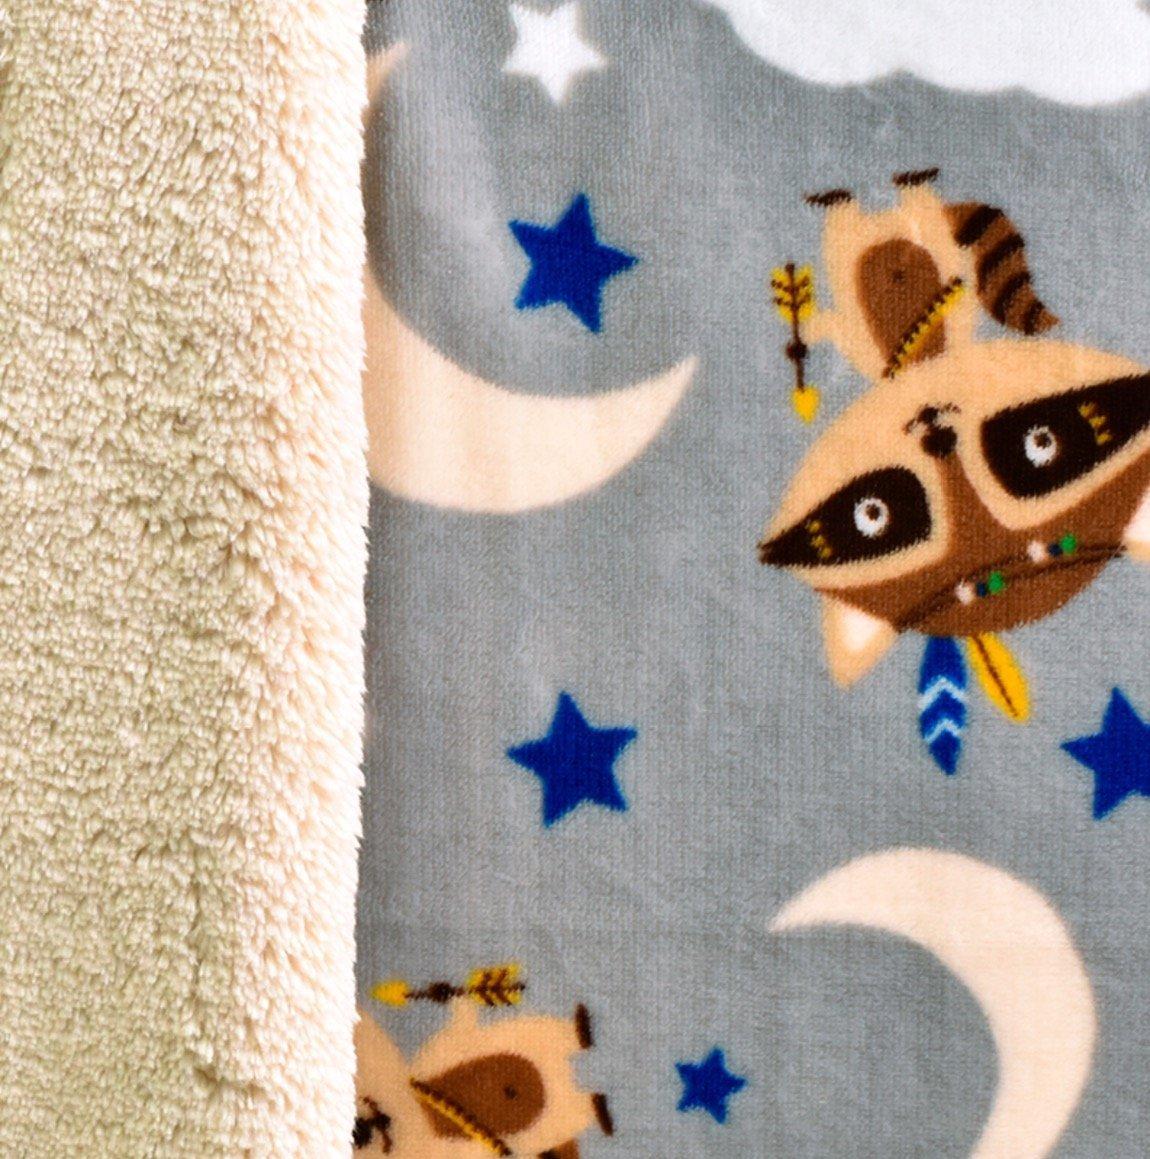 KESS InHouse Heidi Jennings Tribal Chevron Black Fleece Baby Blanket 40 x 30